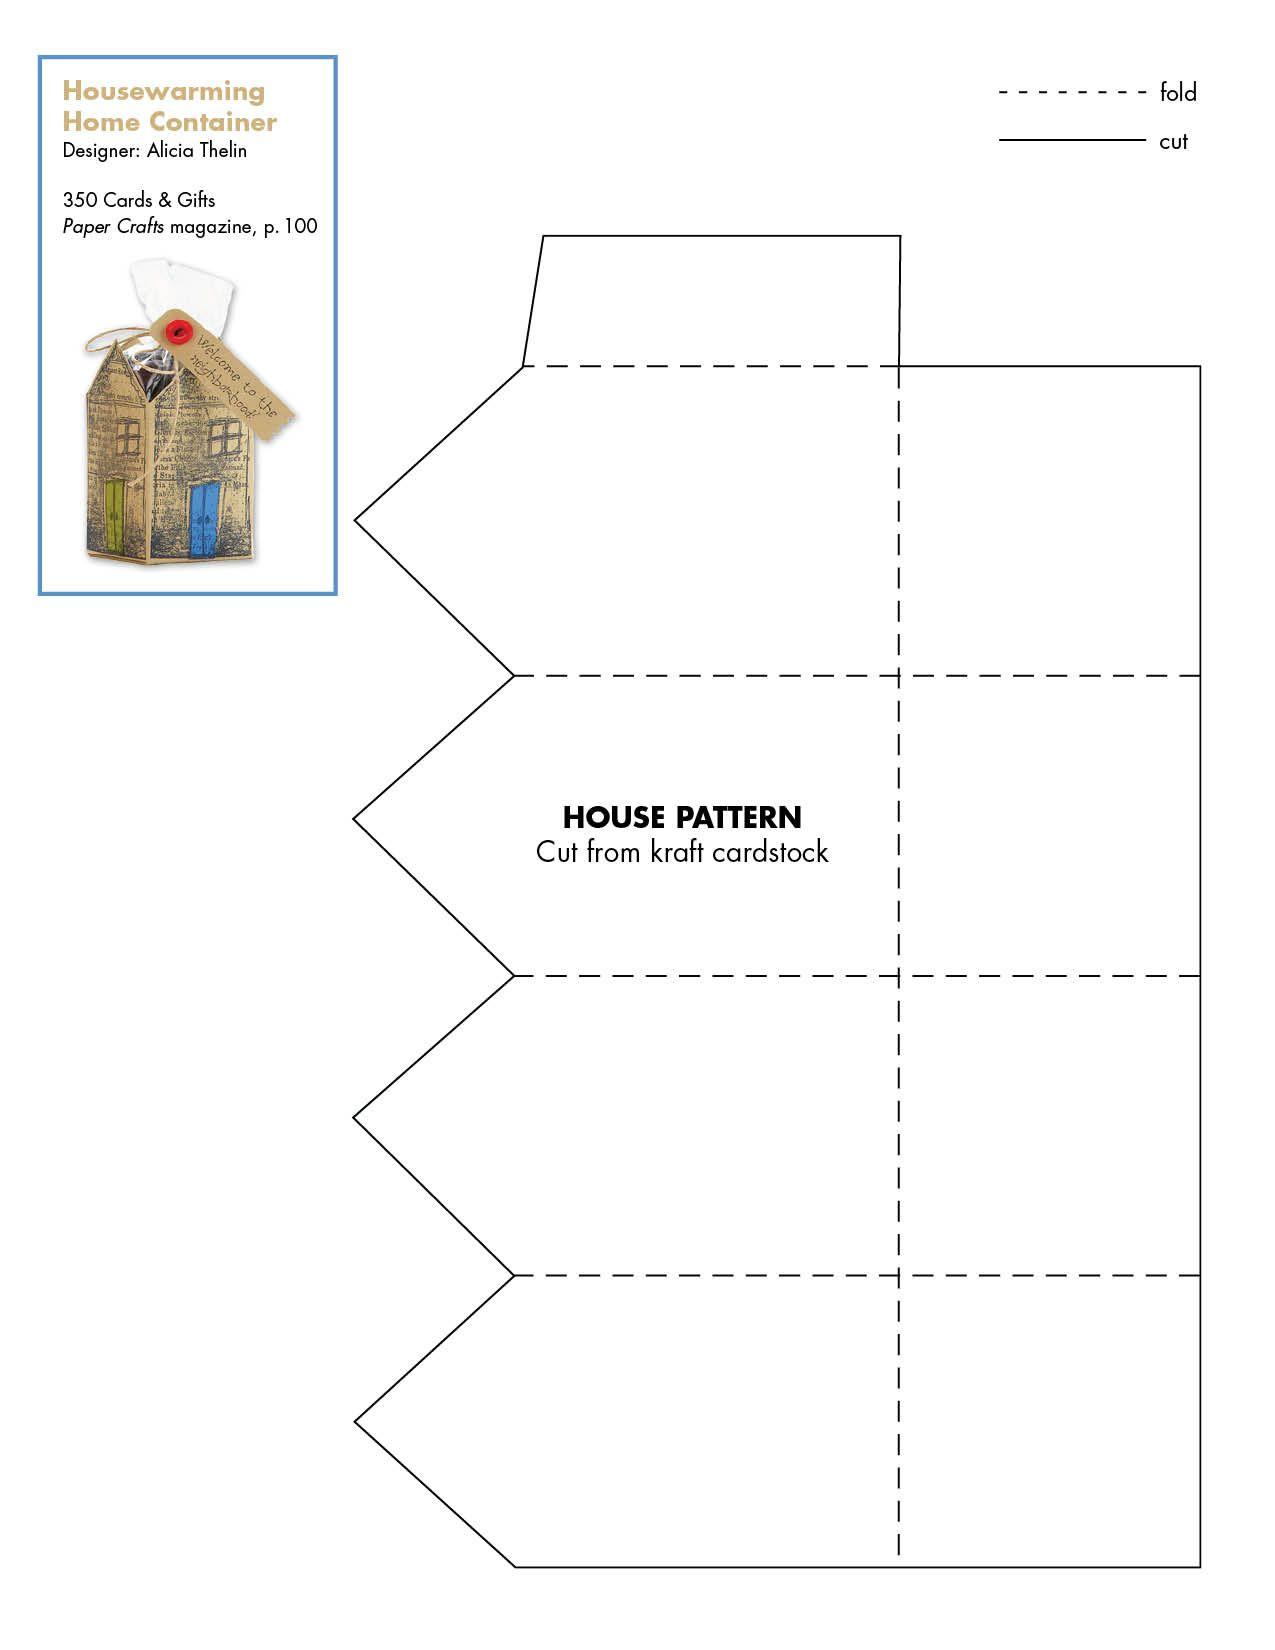 Housewarming_Home_Container.jpg (1275×1650) | Templates | Pinterest ...